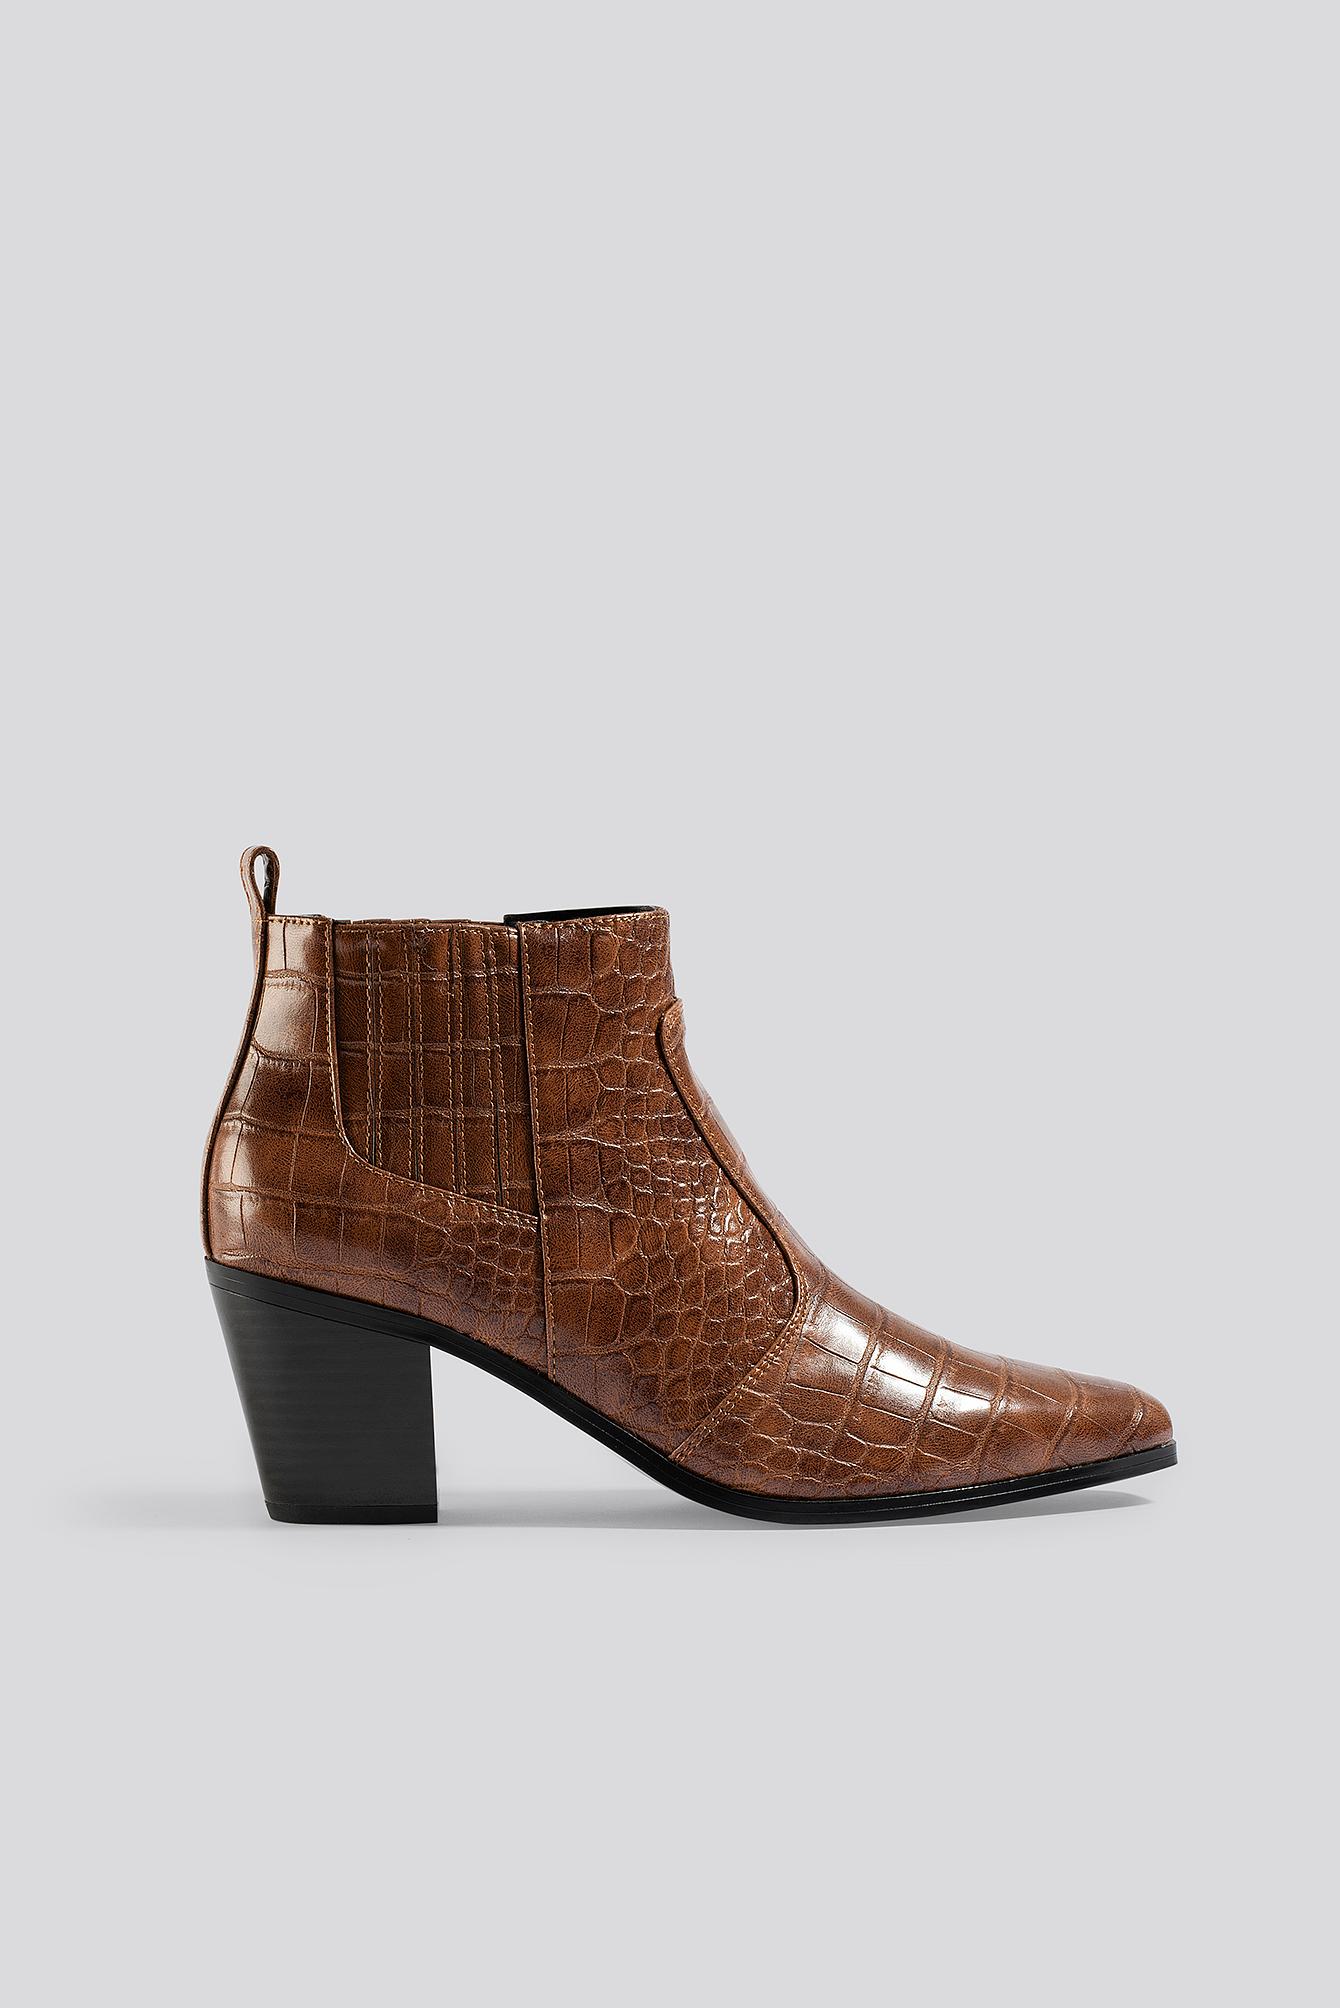 mango -  Dorado Ankle Boots - Brown